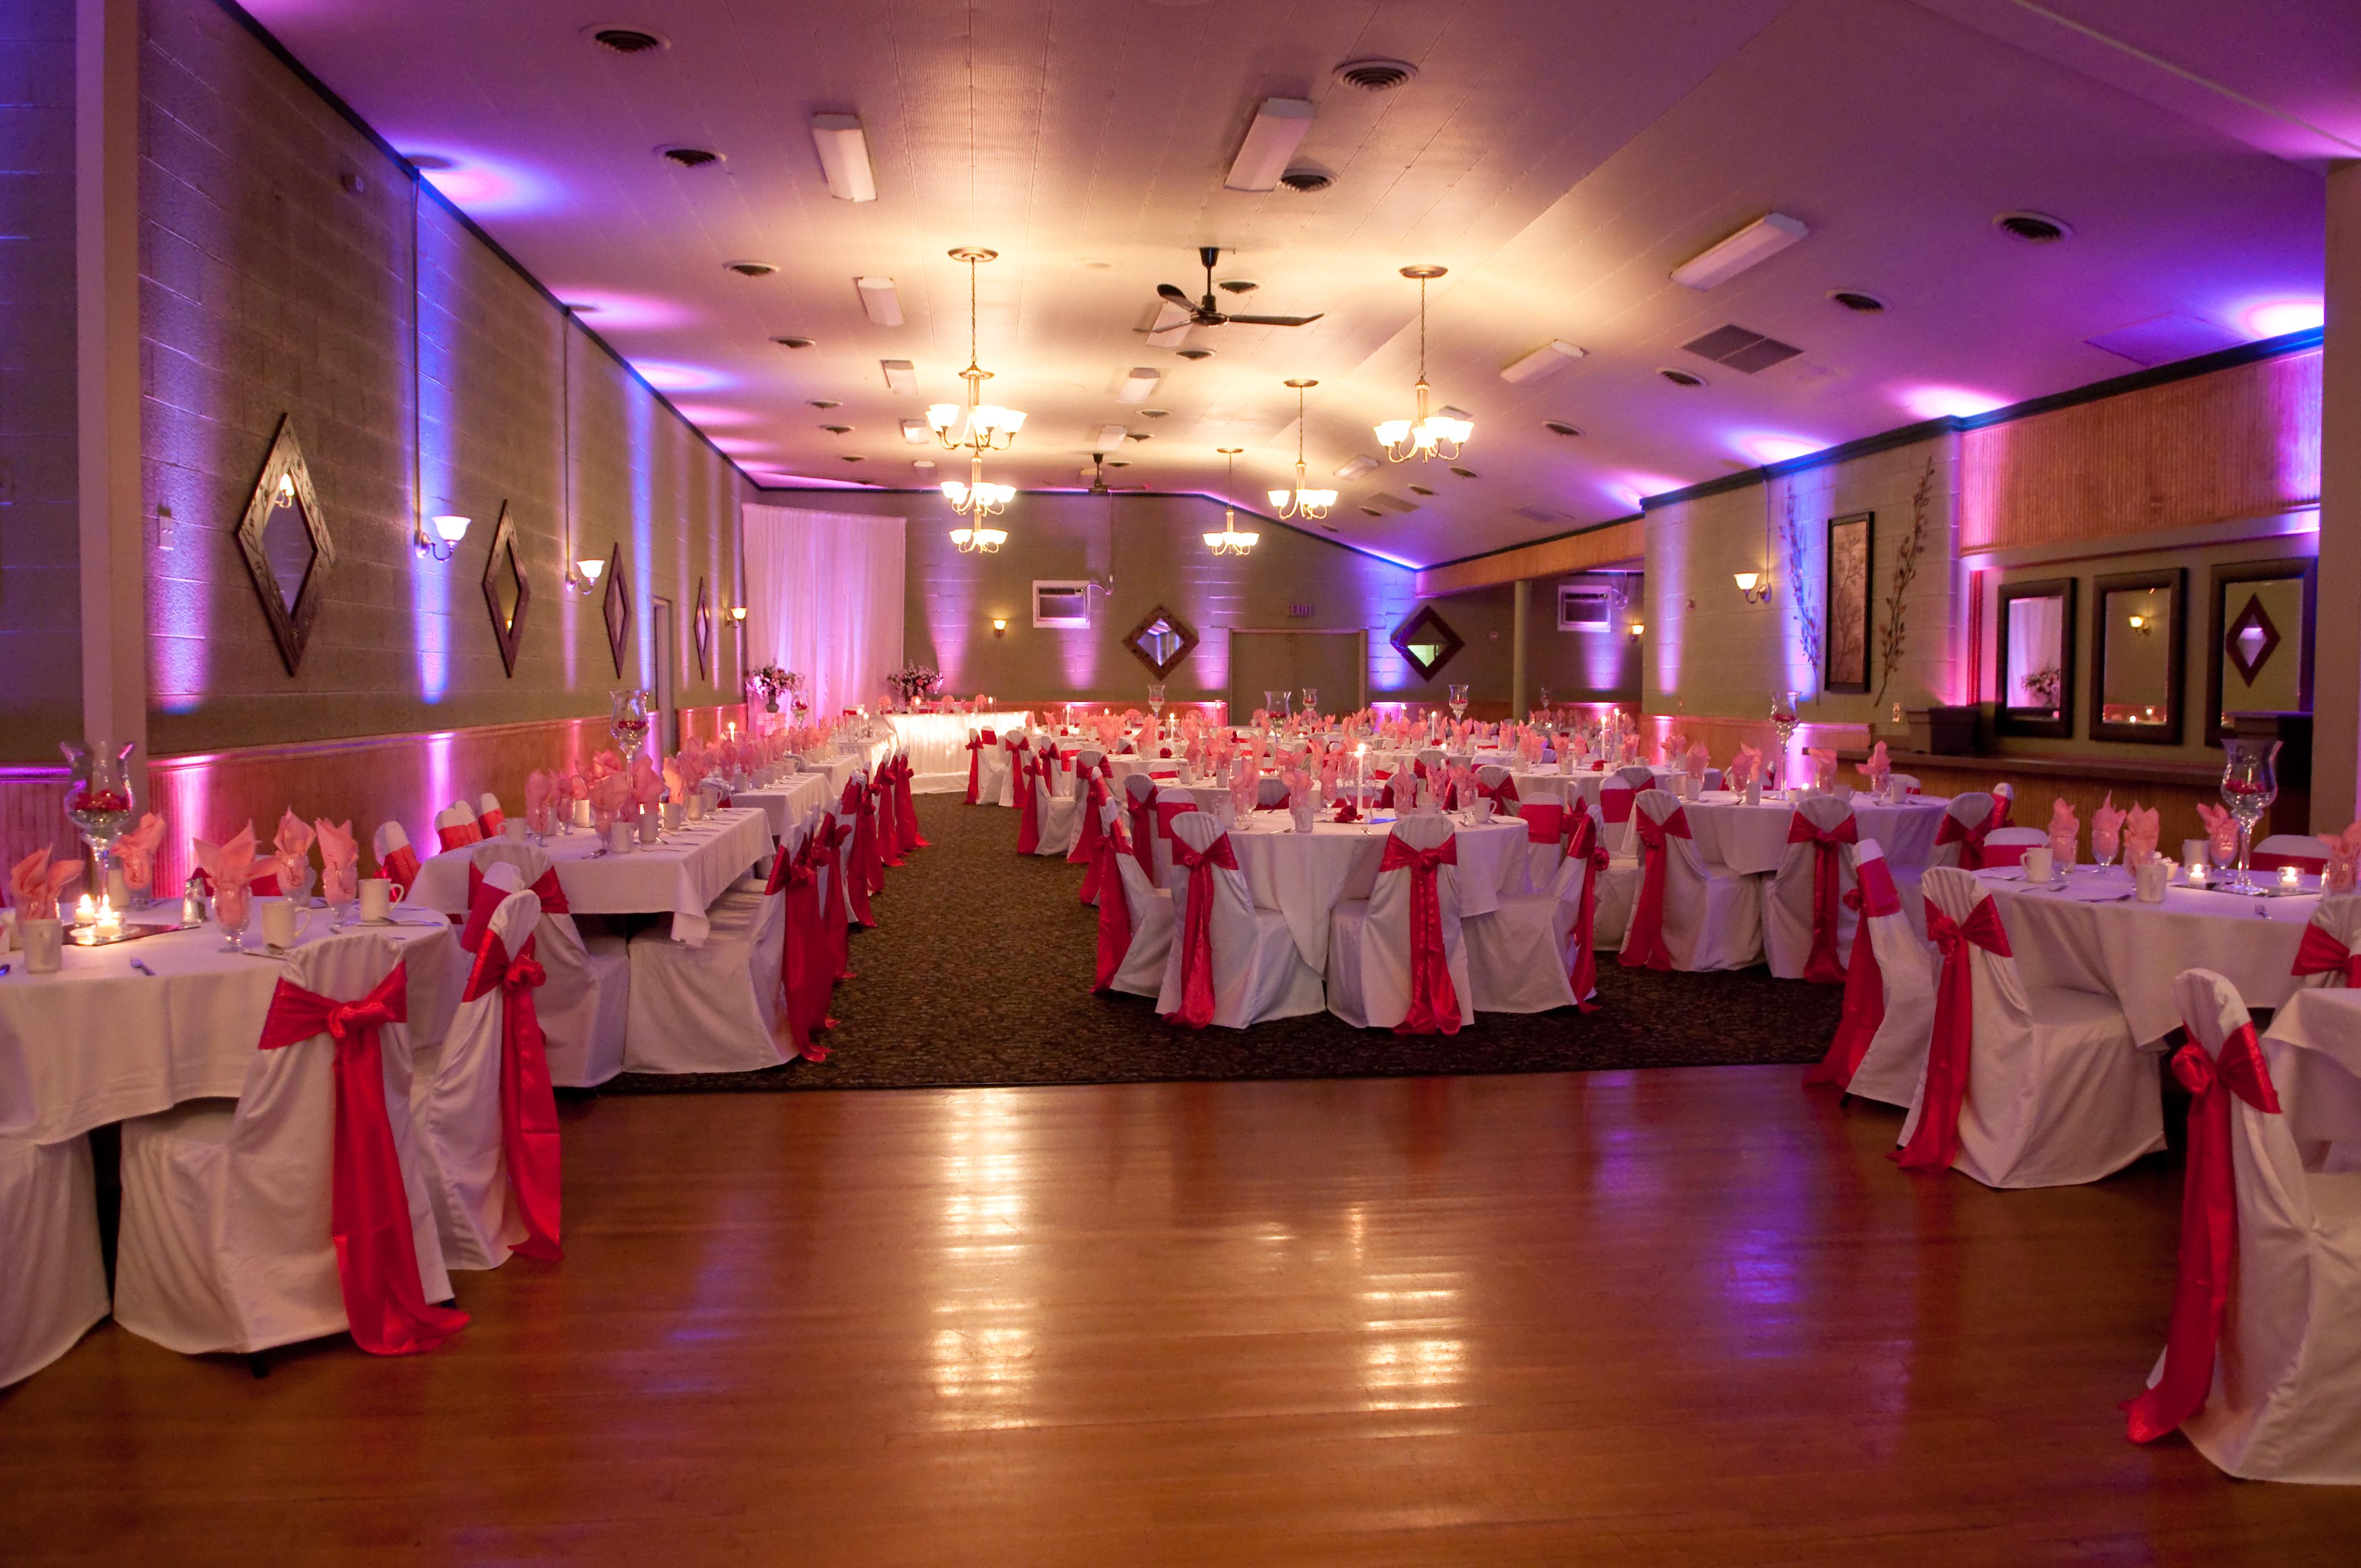 Top 5 Wedding Venues In Dadar For Unmatched Wedding